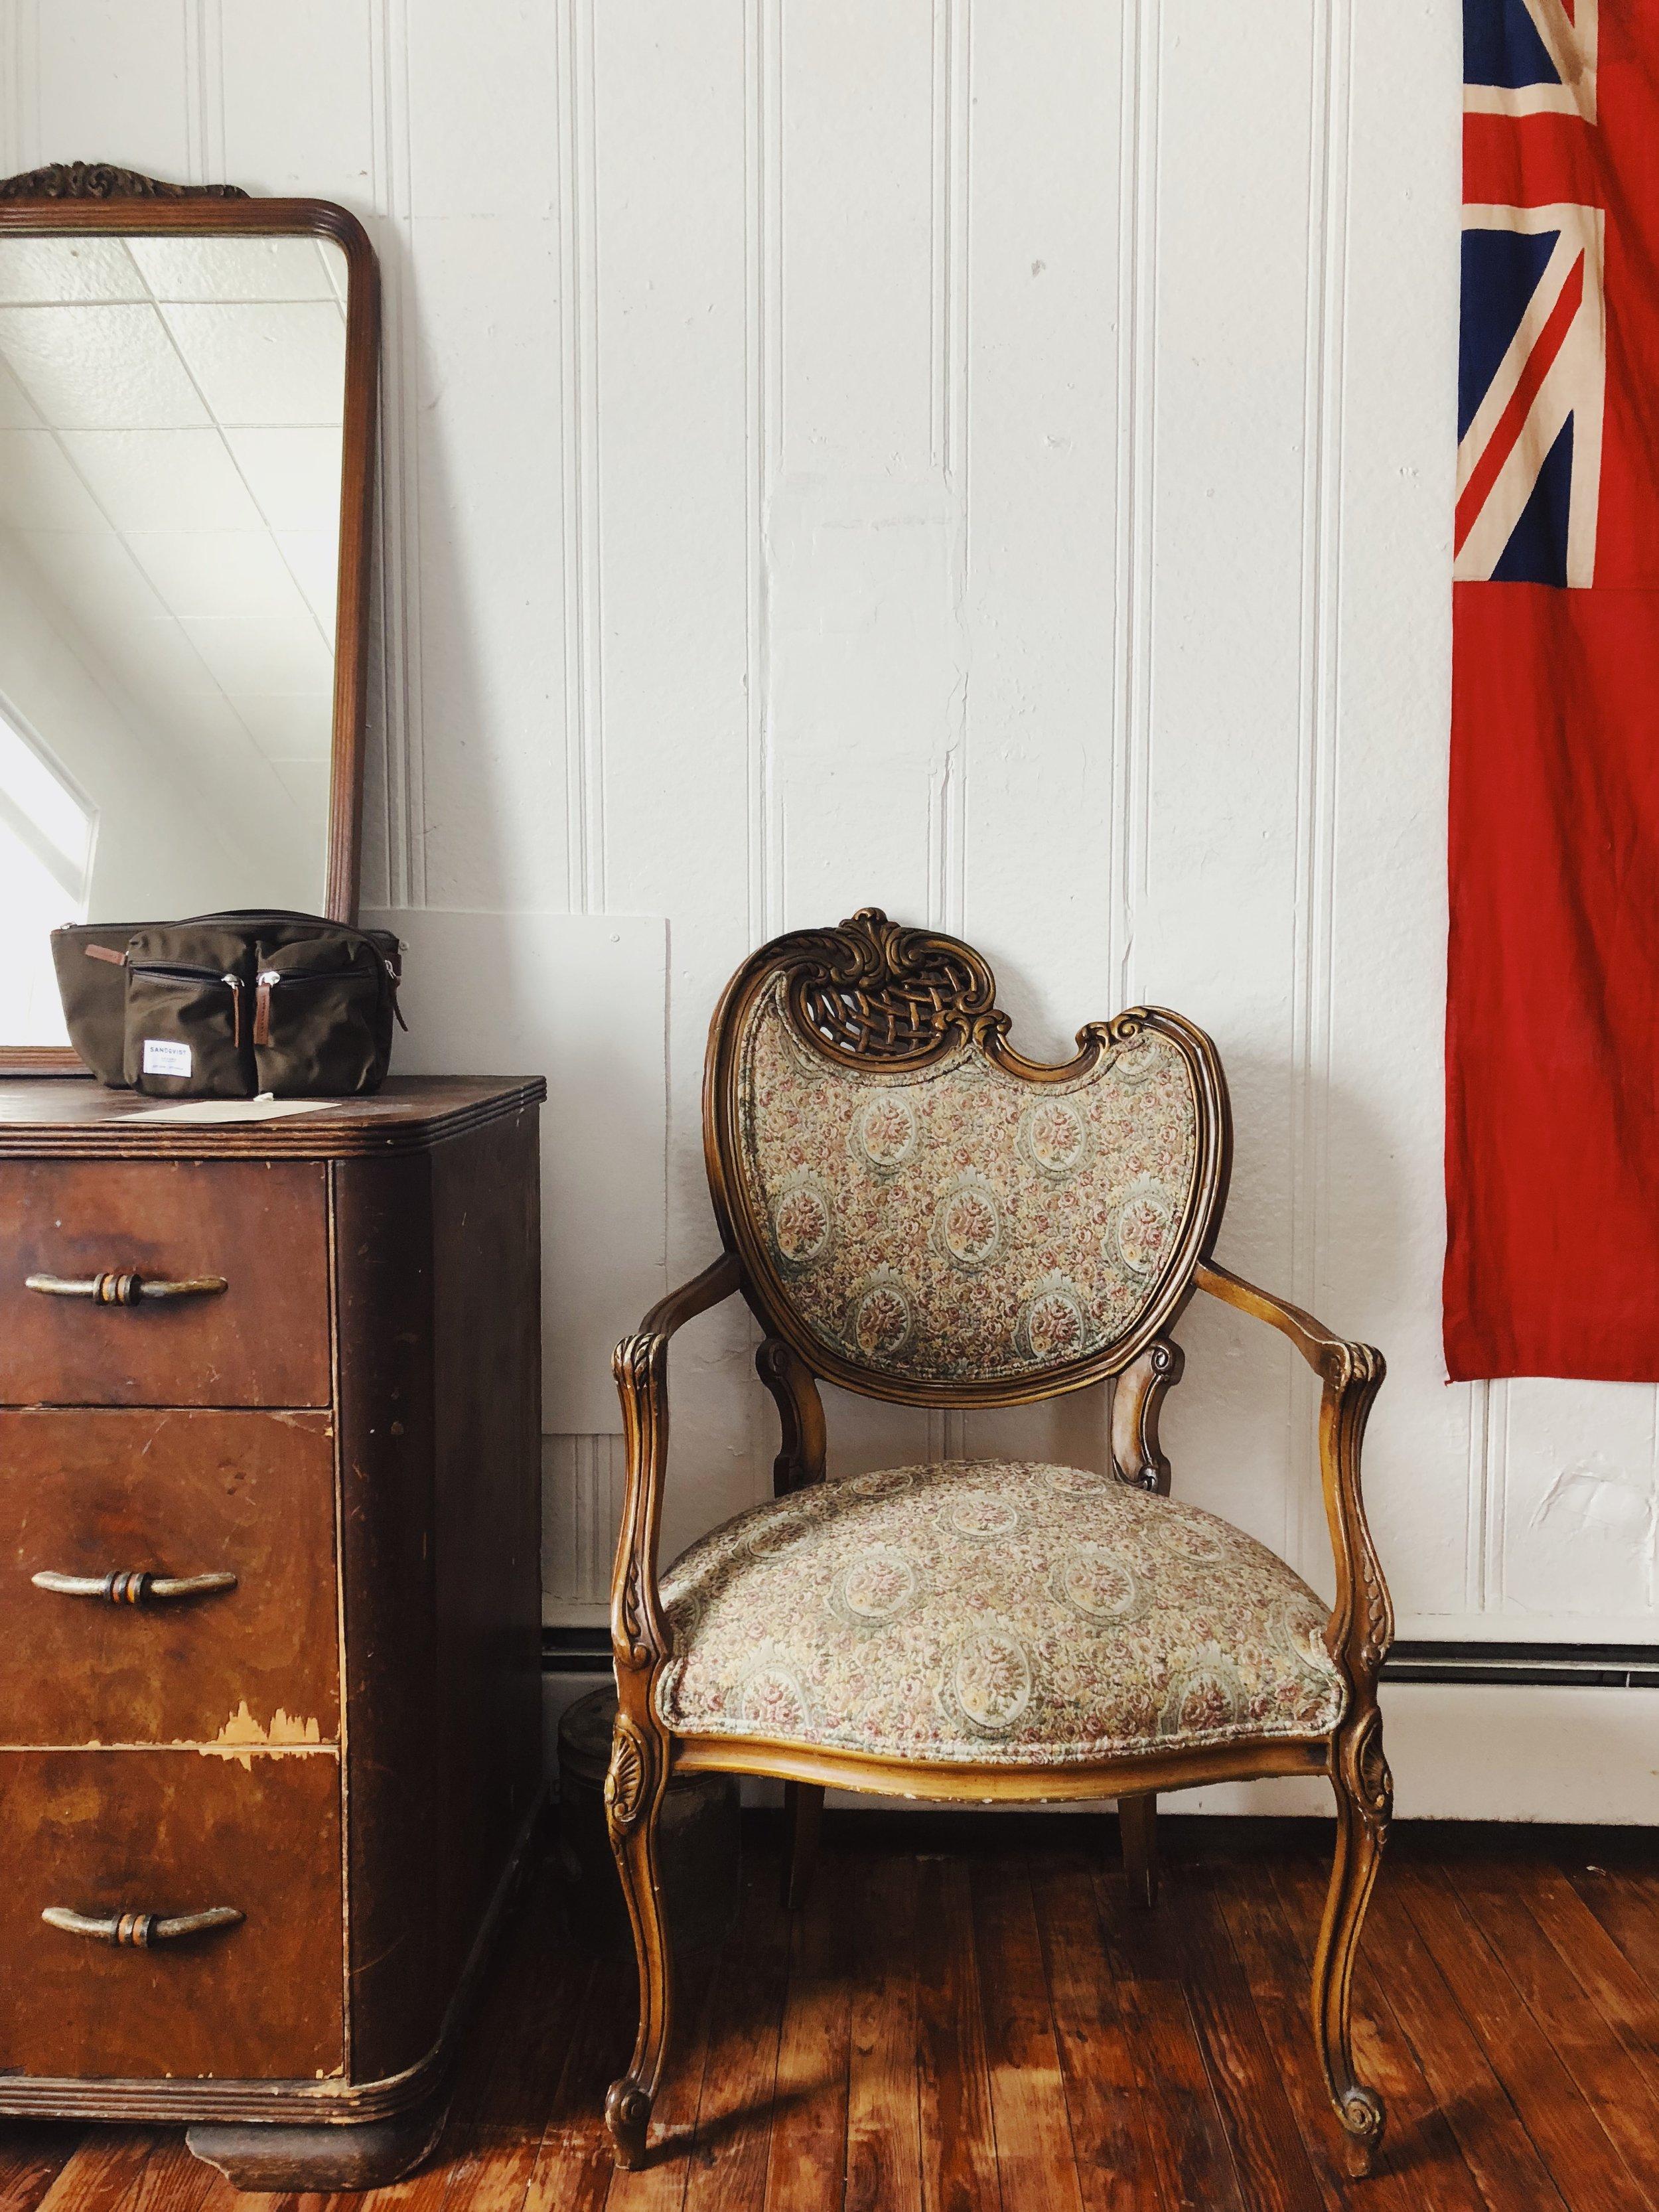 RedCottage_LMFFC_cottage_queenbedroom_armchair.JPG